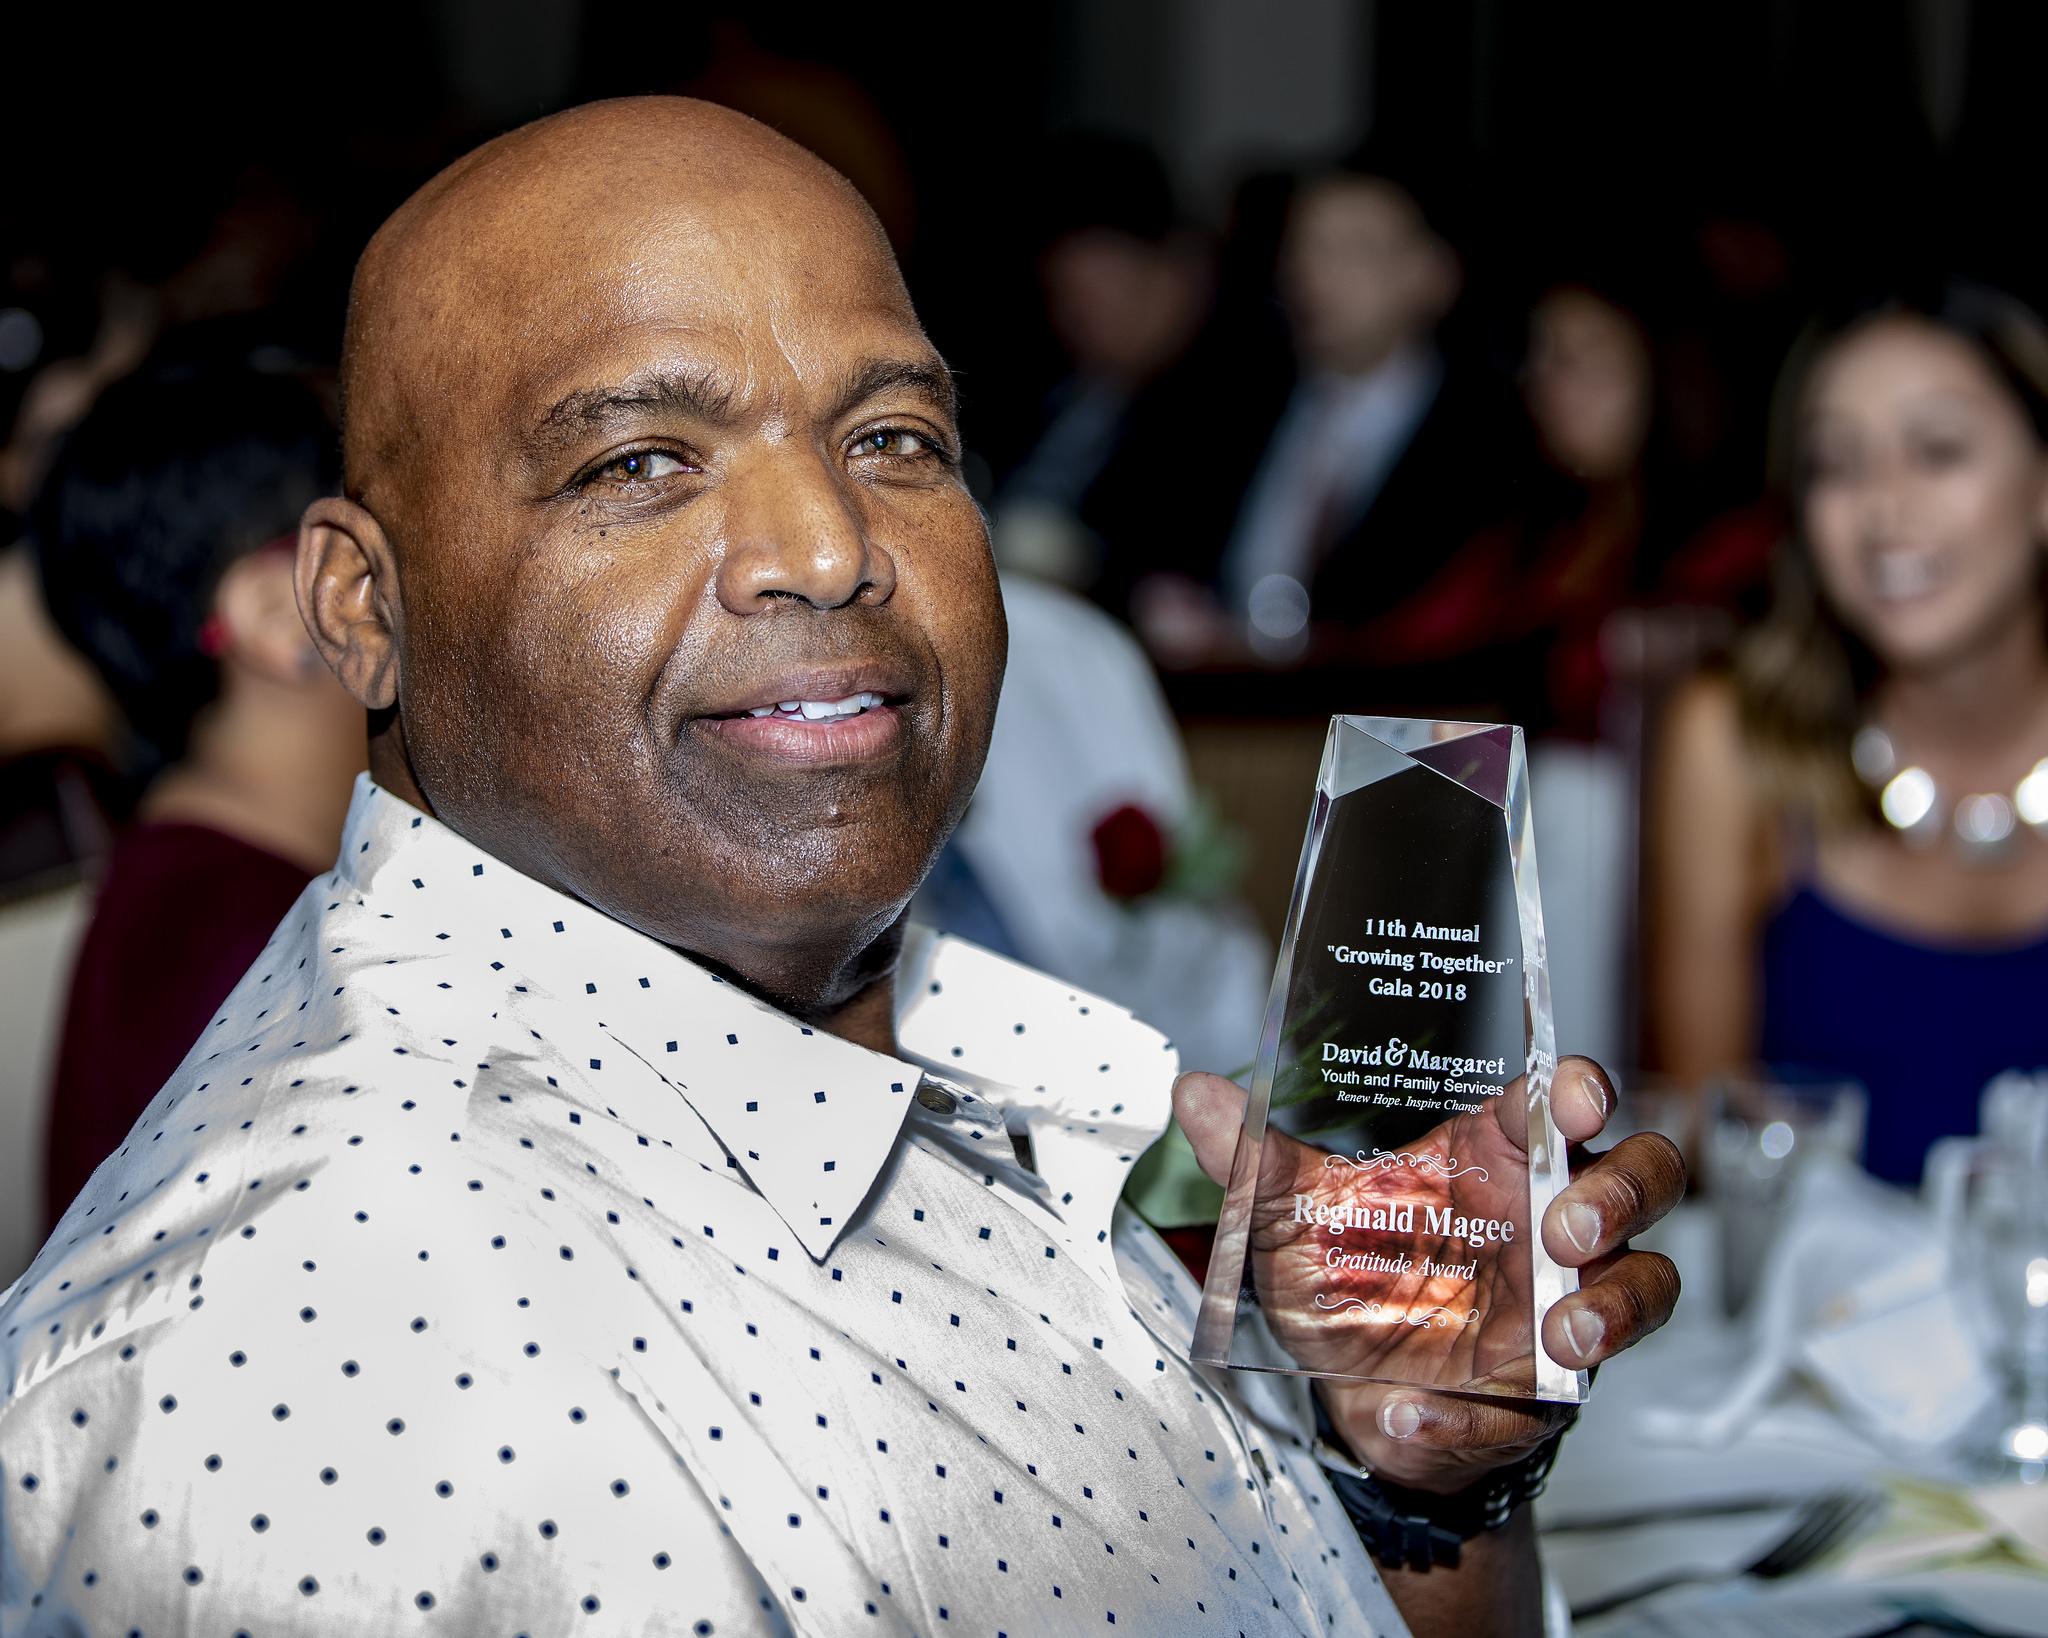 Reginald Magee - 2018 Gratitude Award Recipient